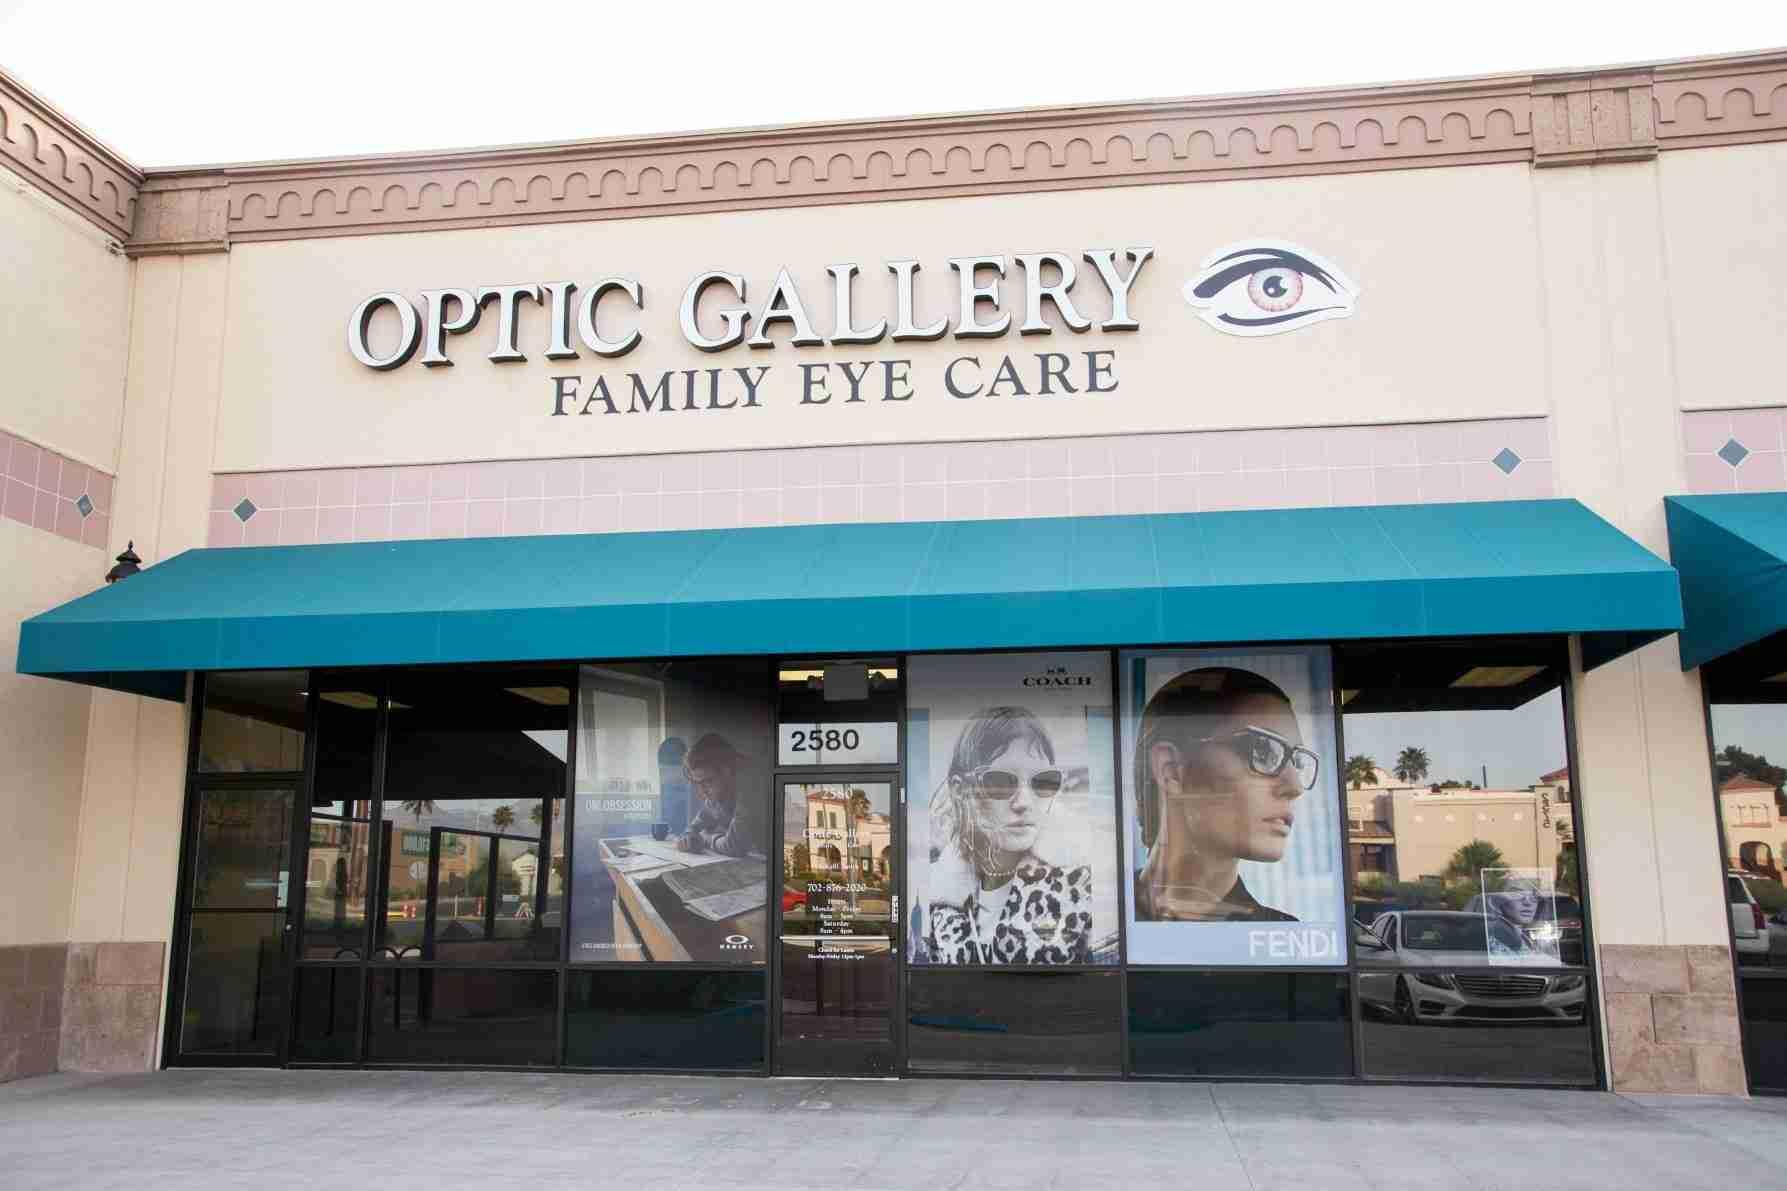 Optic Gallery Sahara 2580 S Decatur Blvd #6, Las Vegas, NV 89102